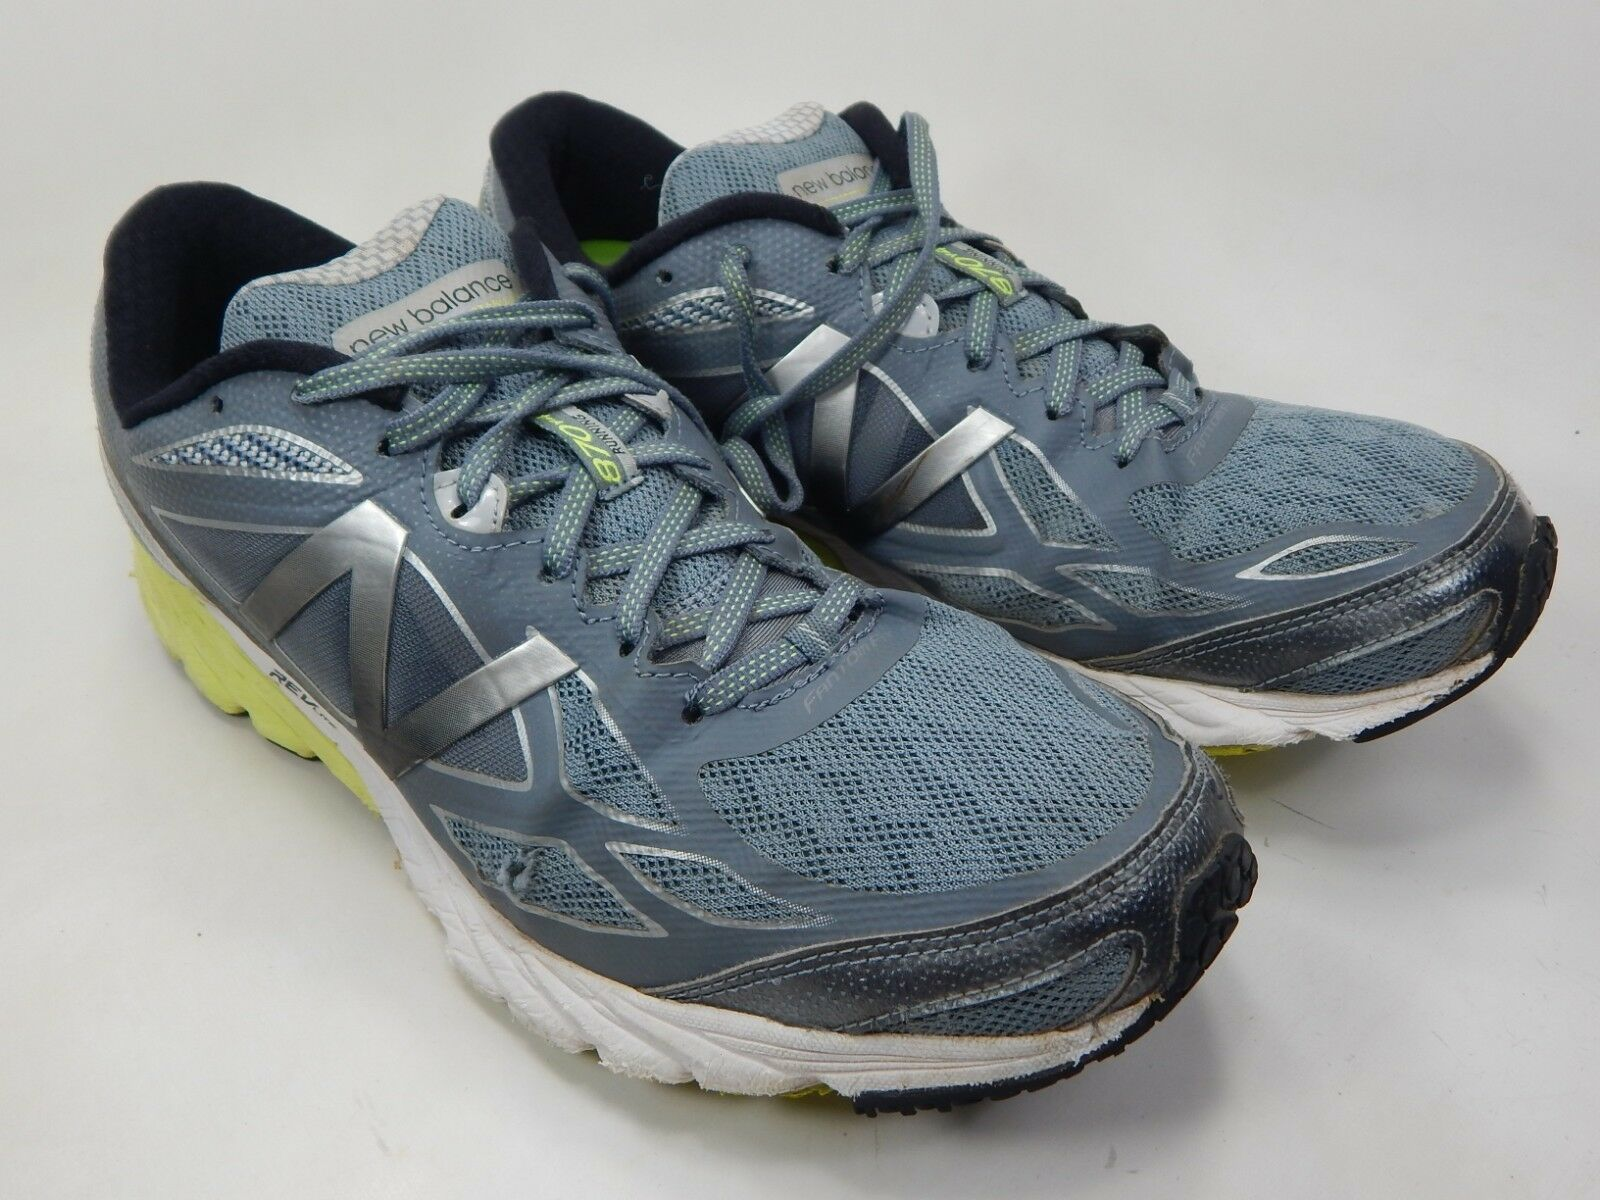 New Balance 870 v4 Size US 10.5 M (D) EU 44.5 Men's Running Shoes Gray M870GY4